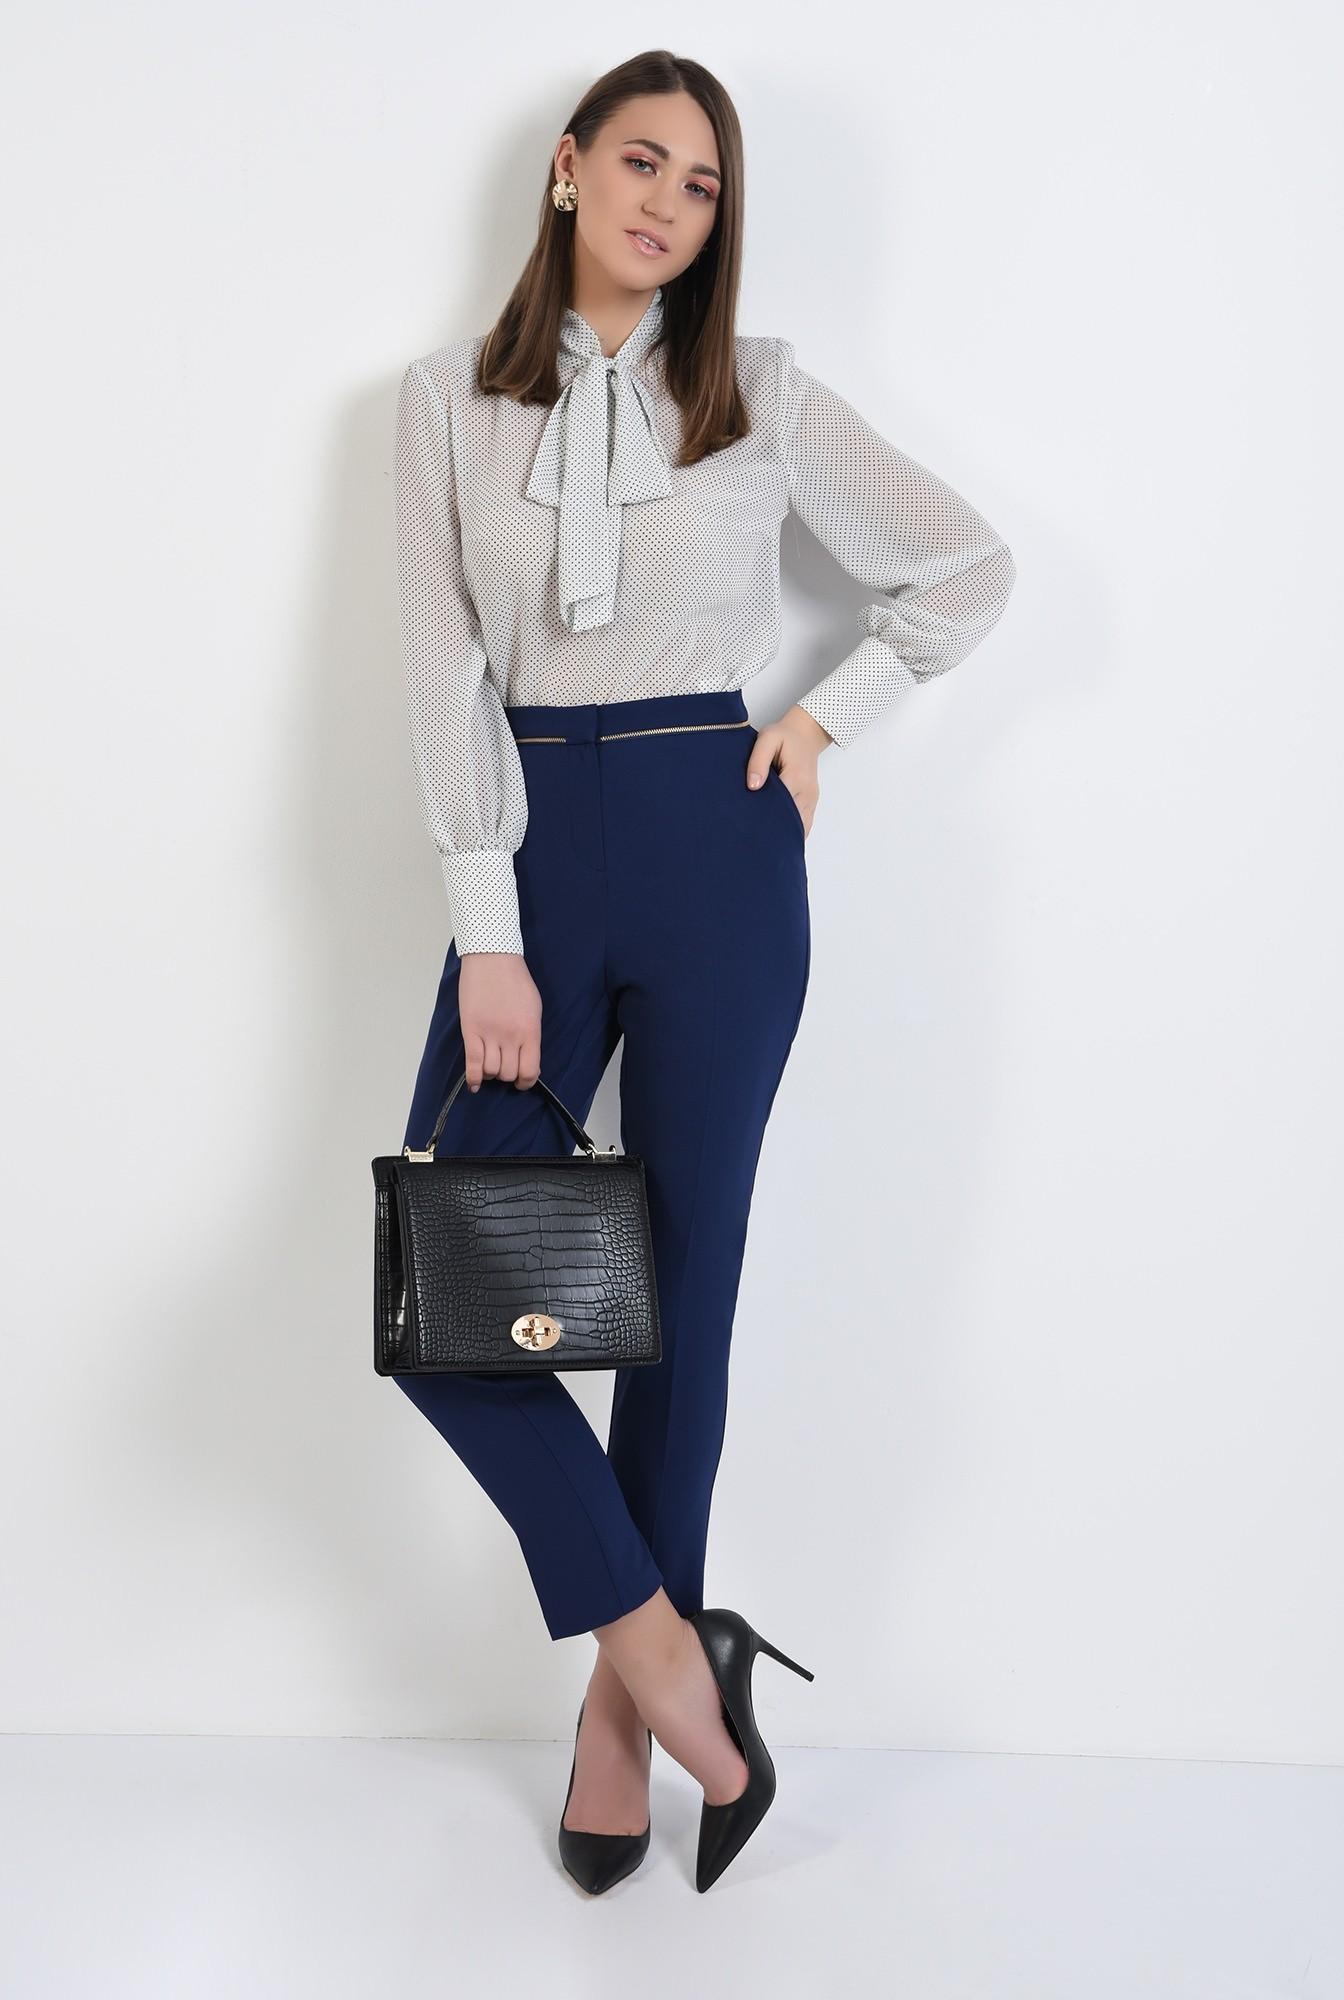 0 - pantaloni office, bleumarin, talie medie, cu buzunare, pantaloni de primavara